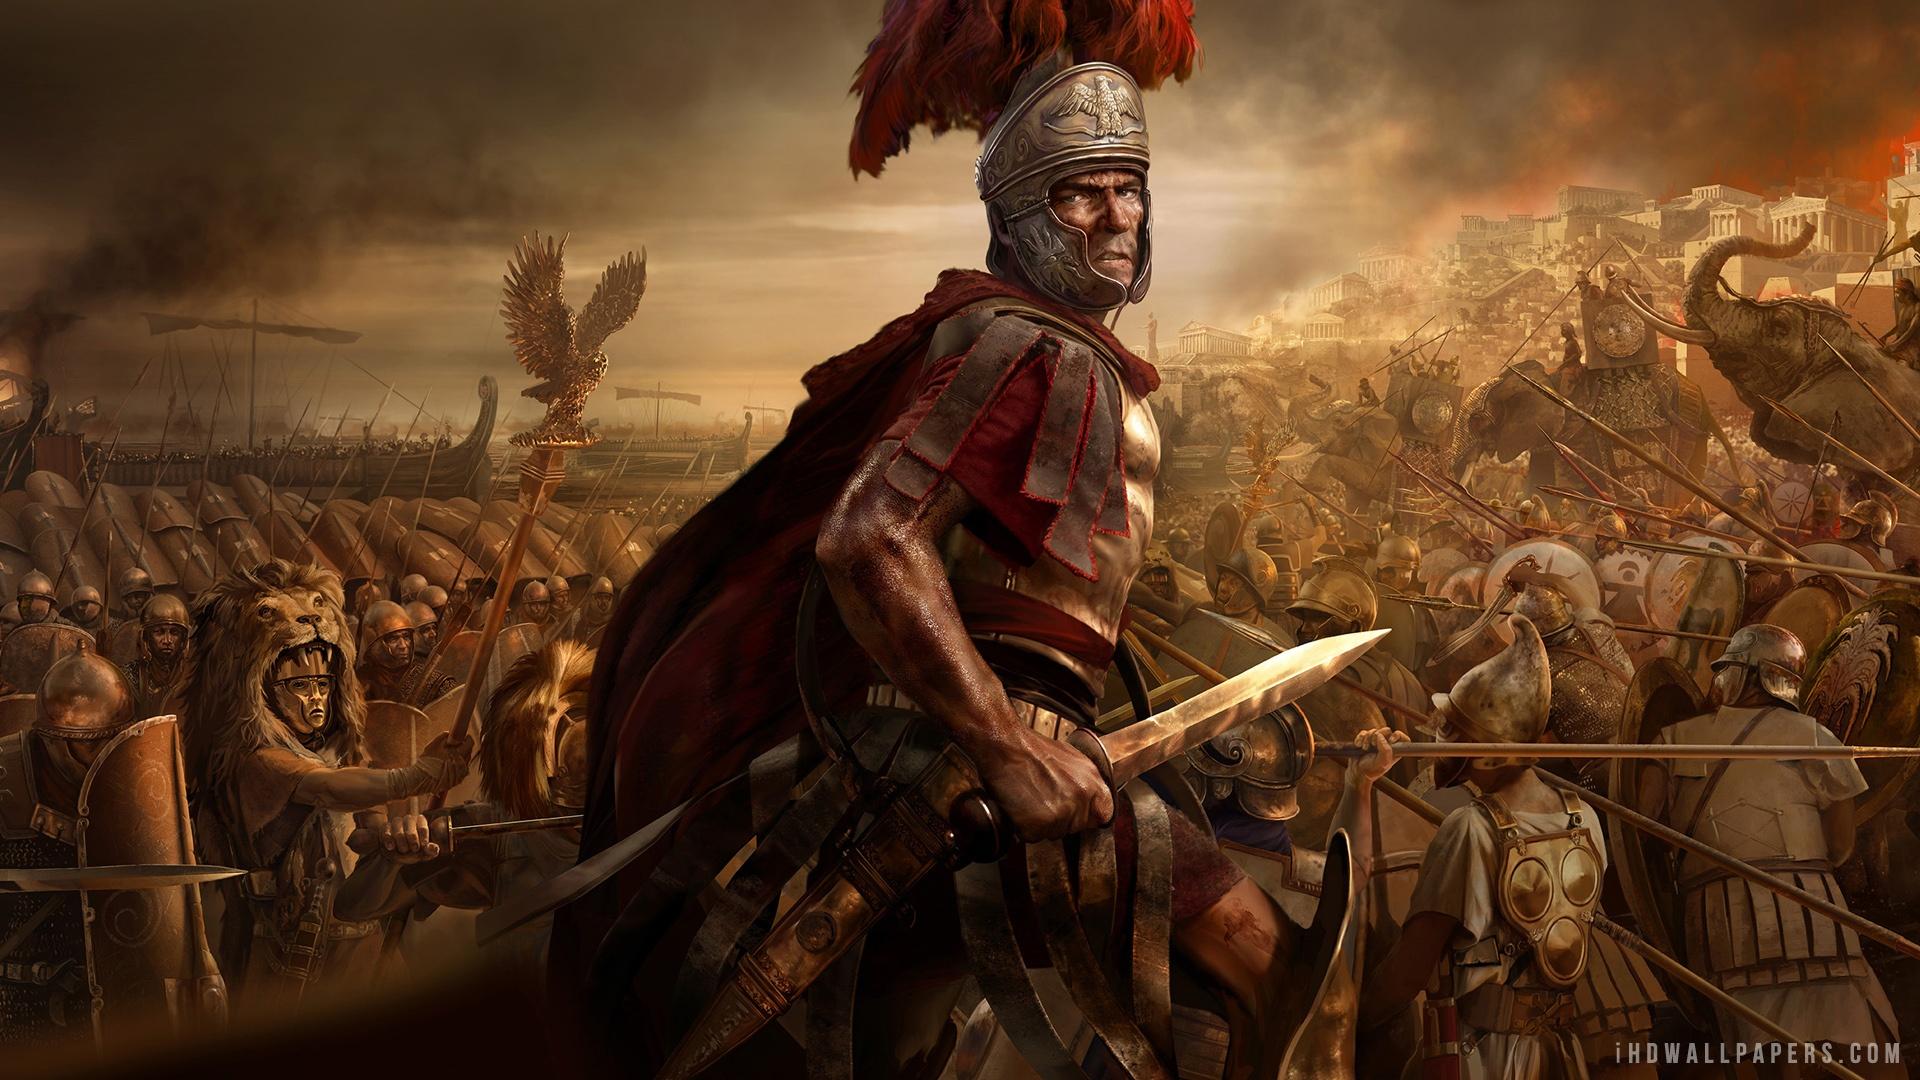 Total War Rome 2 HD Wallpaper - iHD Wallpapers